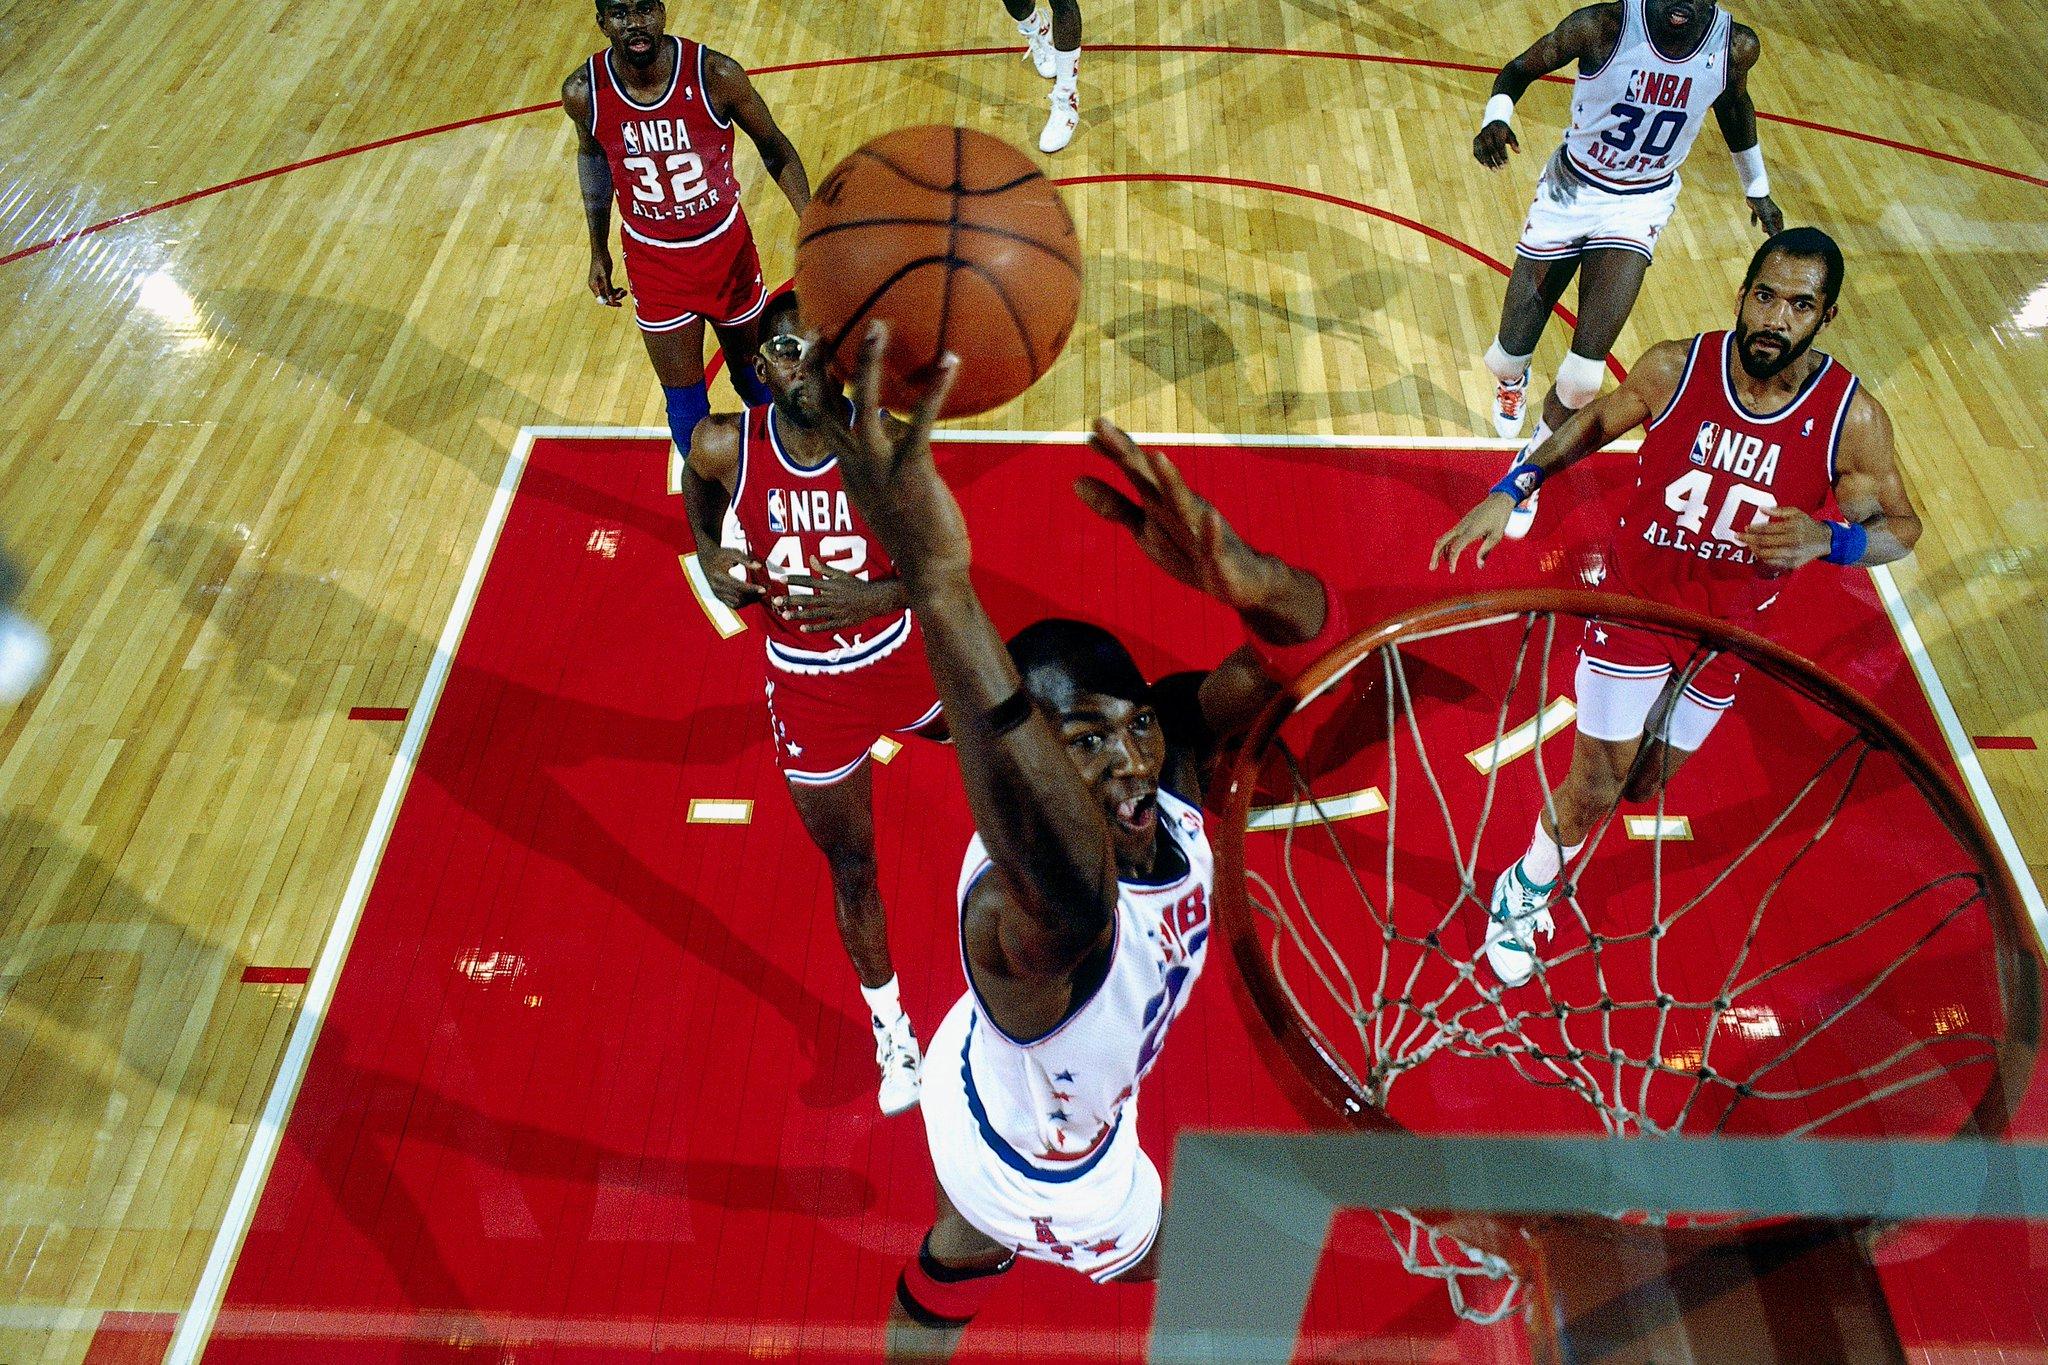 1988 #NBAAllStar Chicago Friday Flashback...   Michael Jordan earns MVP with 40 points (17/23 FG)! https://t.co/OVB9nGH6SA